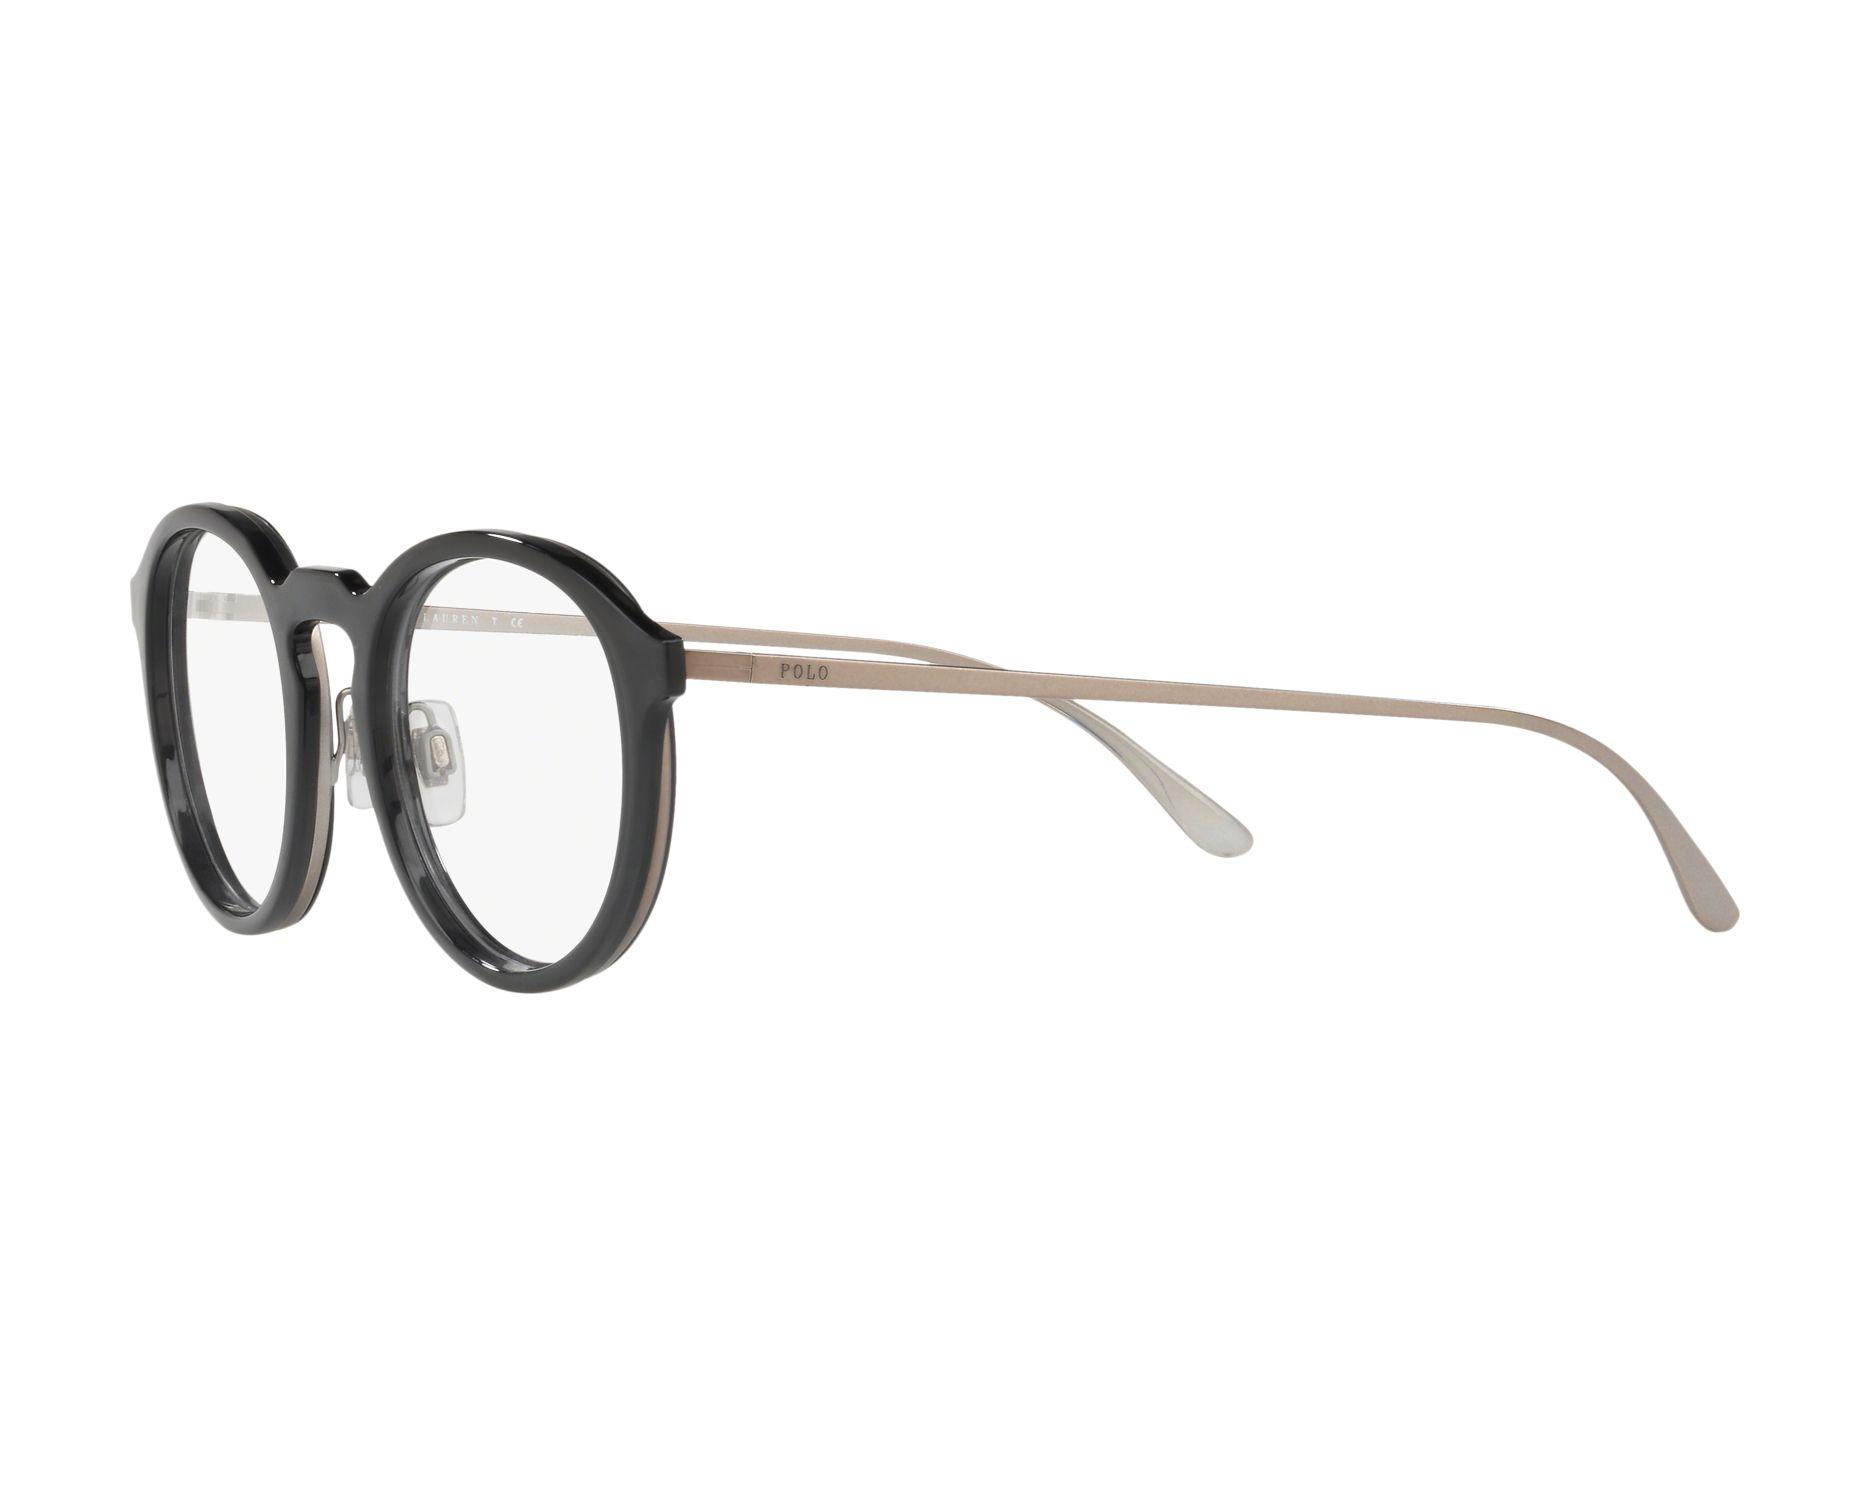 c2090d5a104 eyeglasses Ralph Lauren PH-2188 5696 50-21 Grey Silver 360 degree view 3